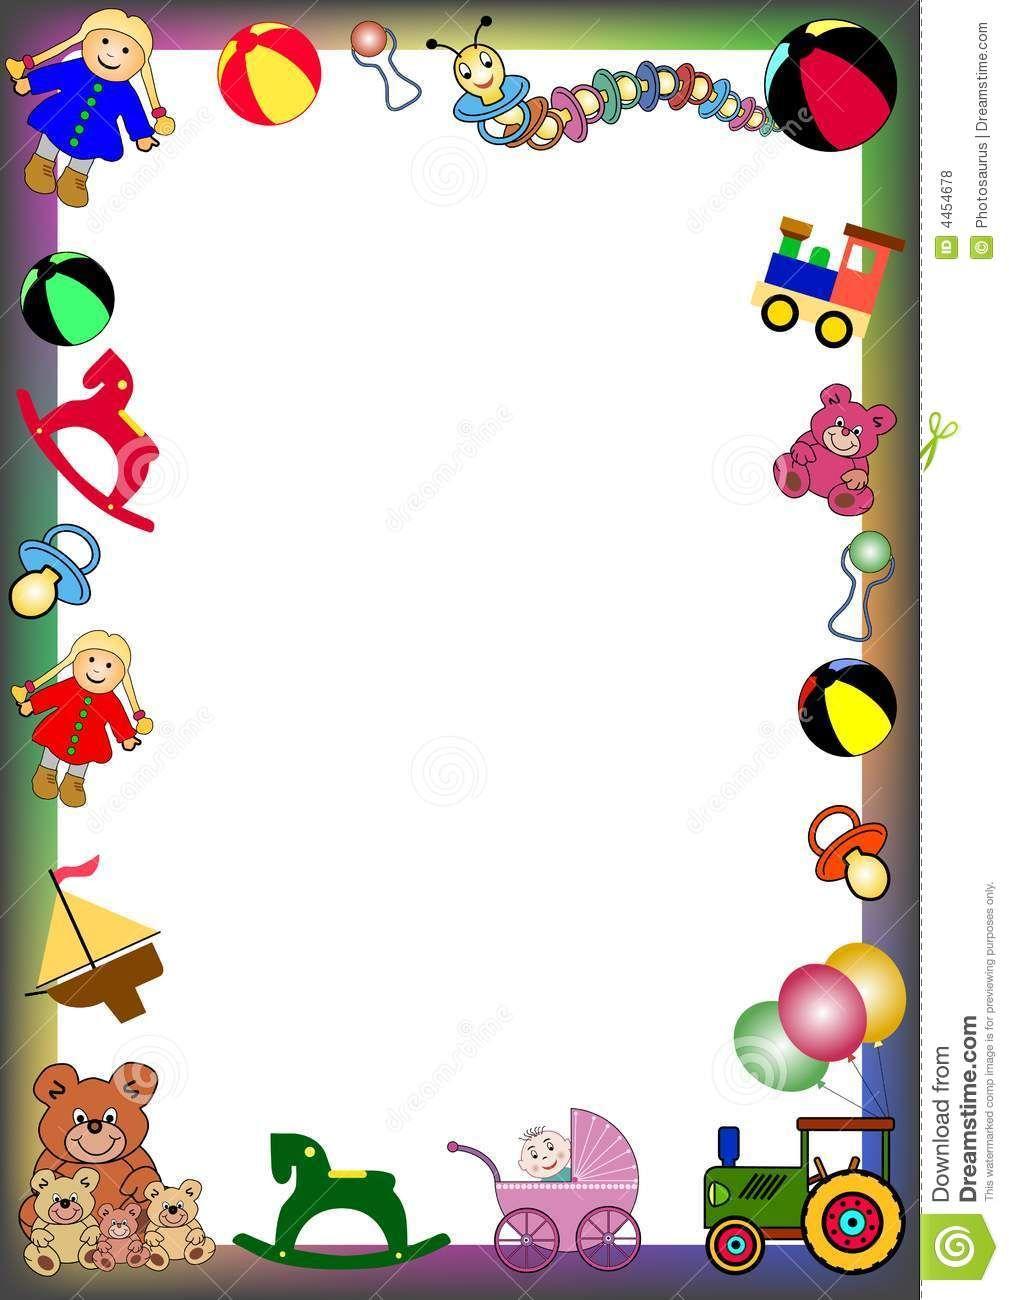 Toys border clipart clip transparent stock bath toys clipart - Google Search | Border and corner ... clip transparent stock